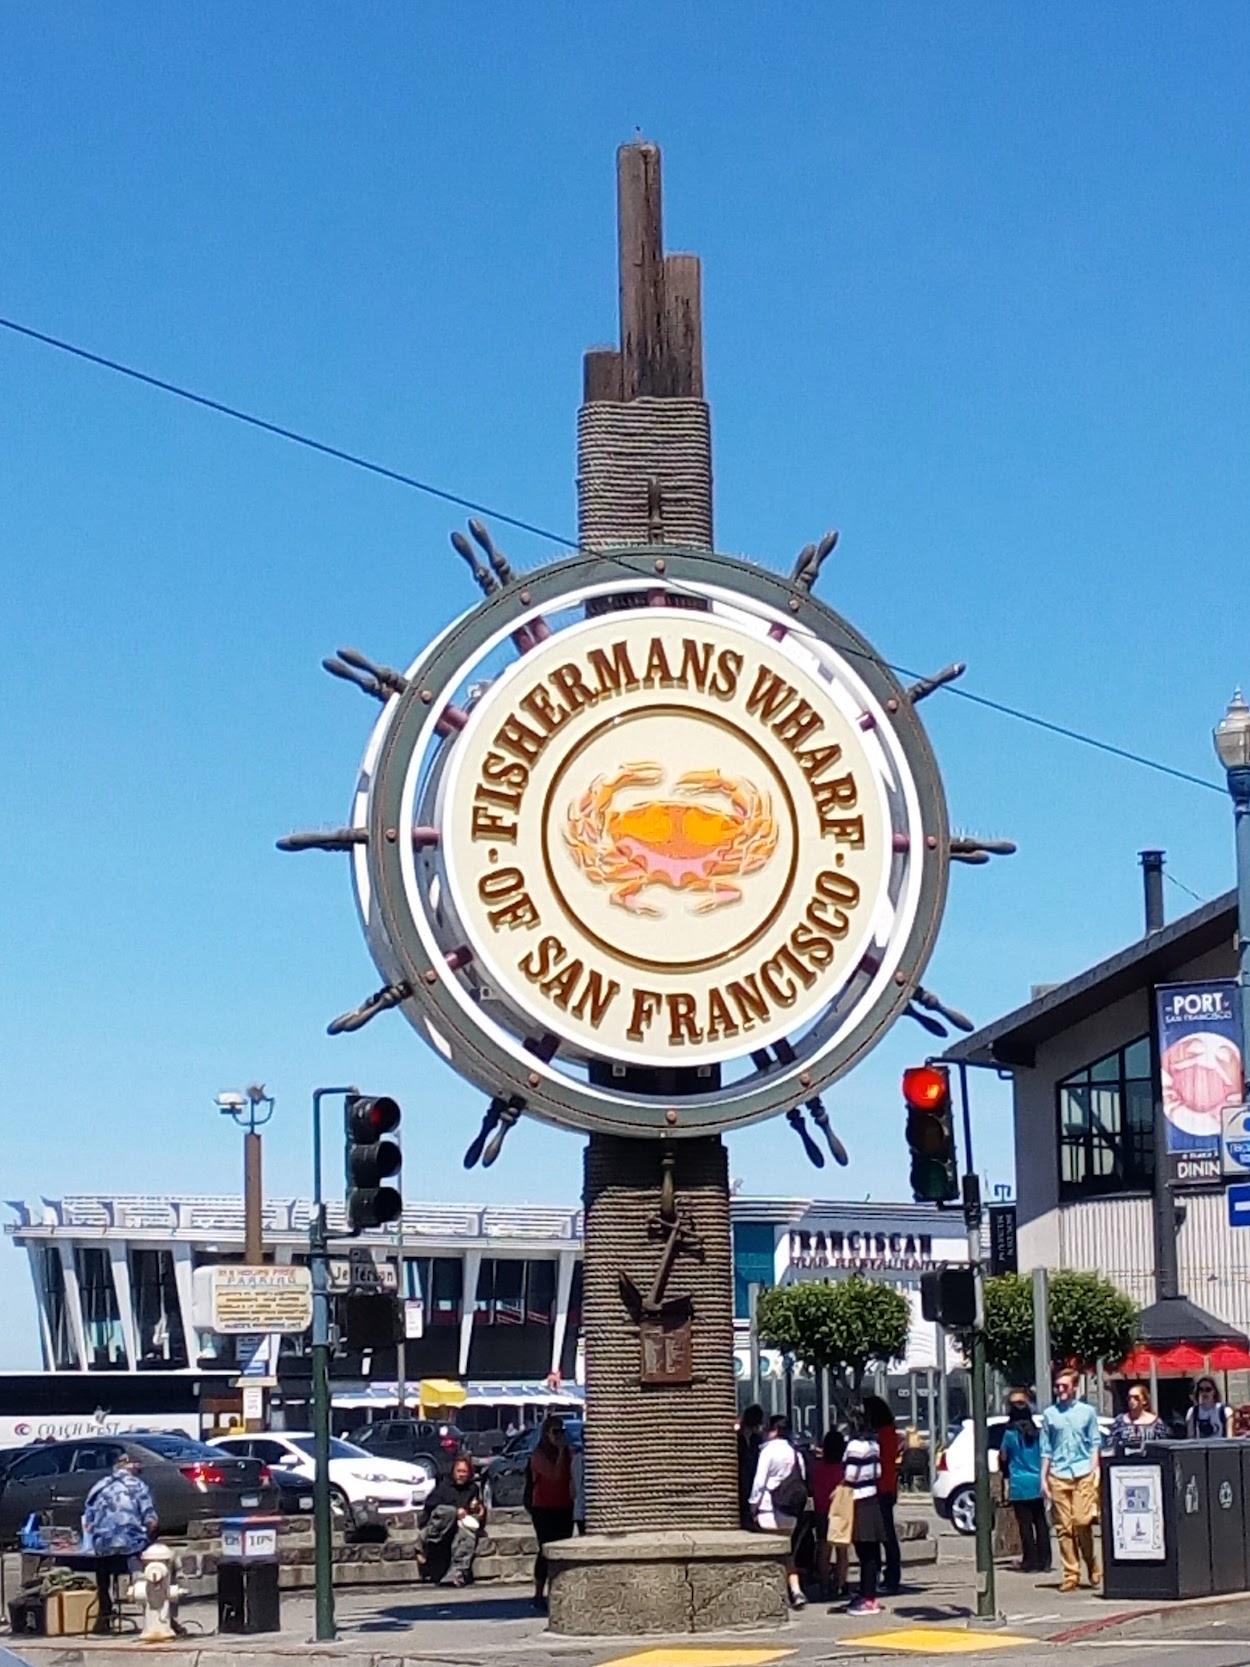 San Francisco Bay Area - Fishermans Wharf